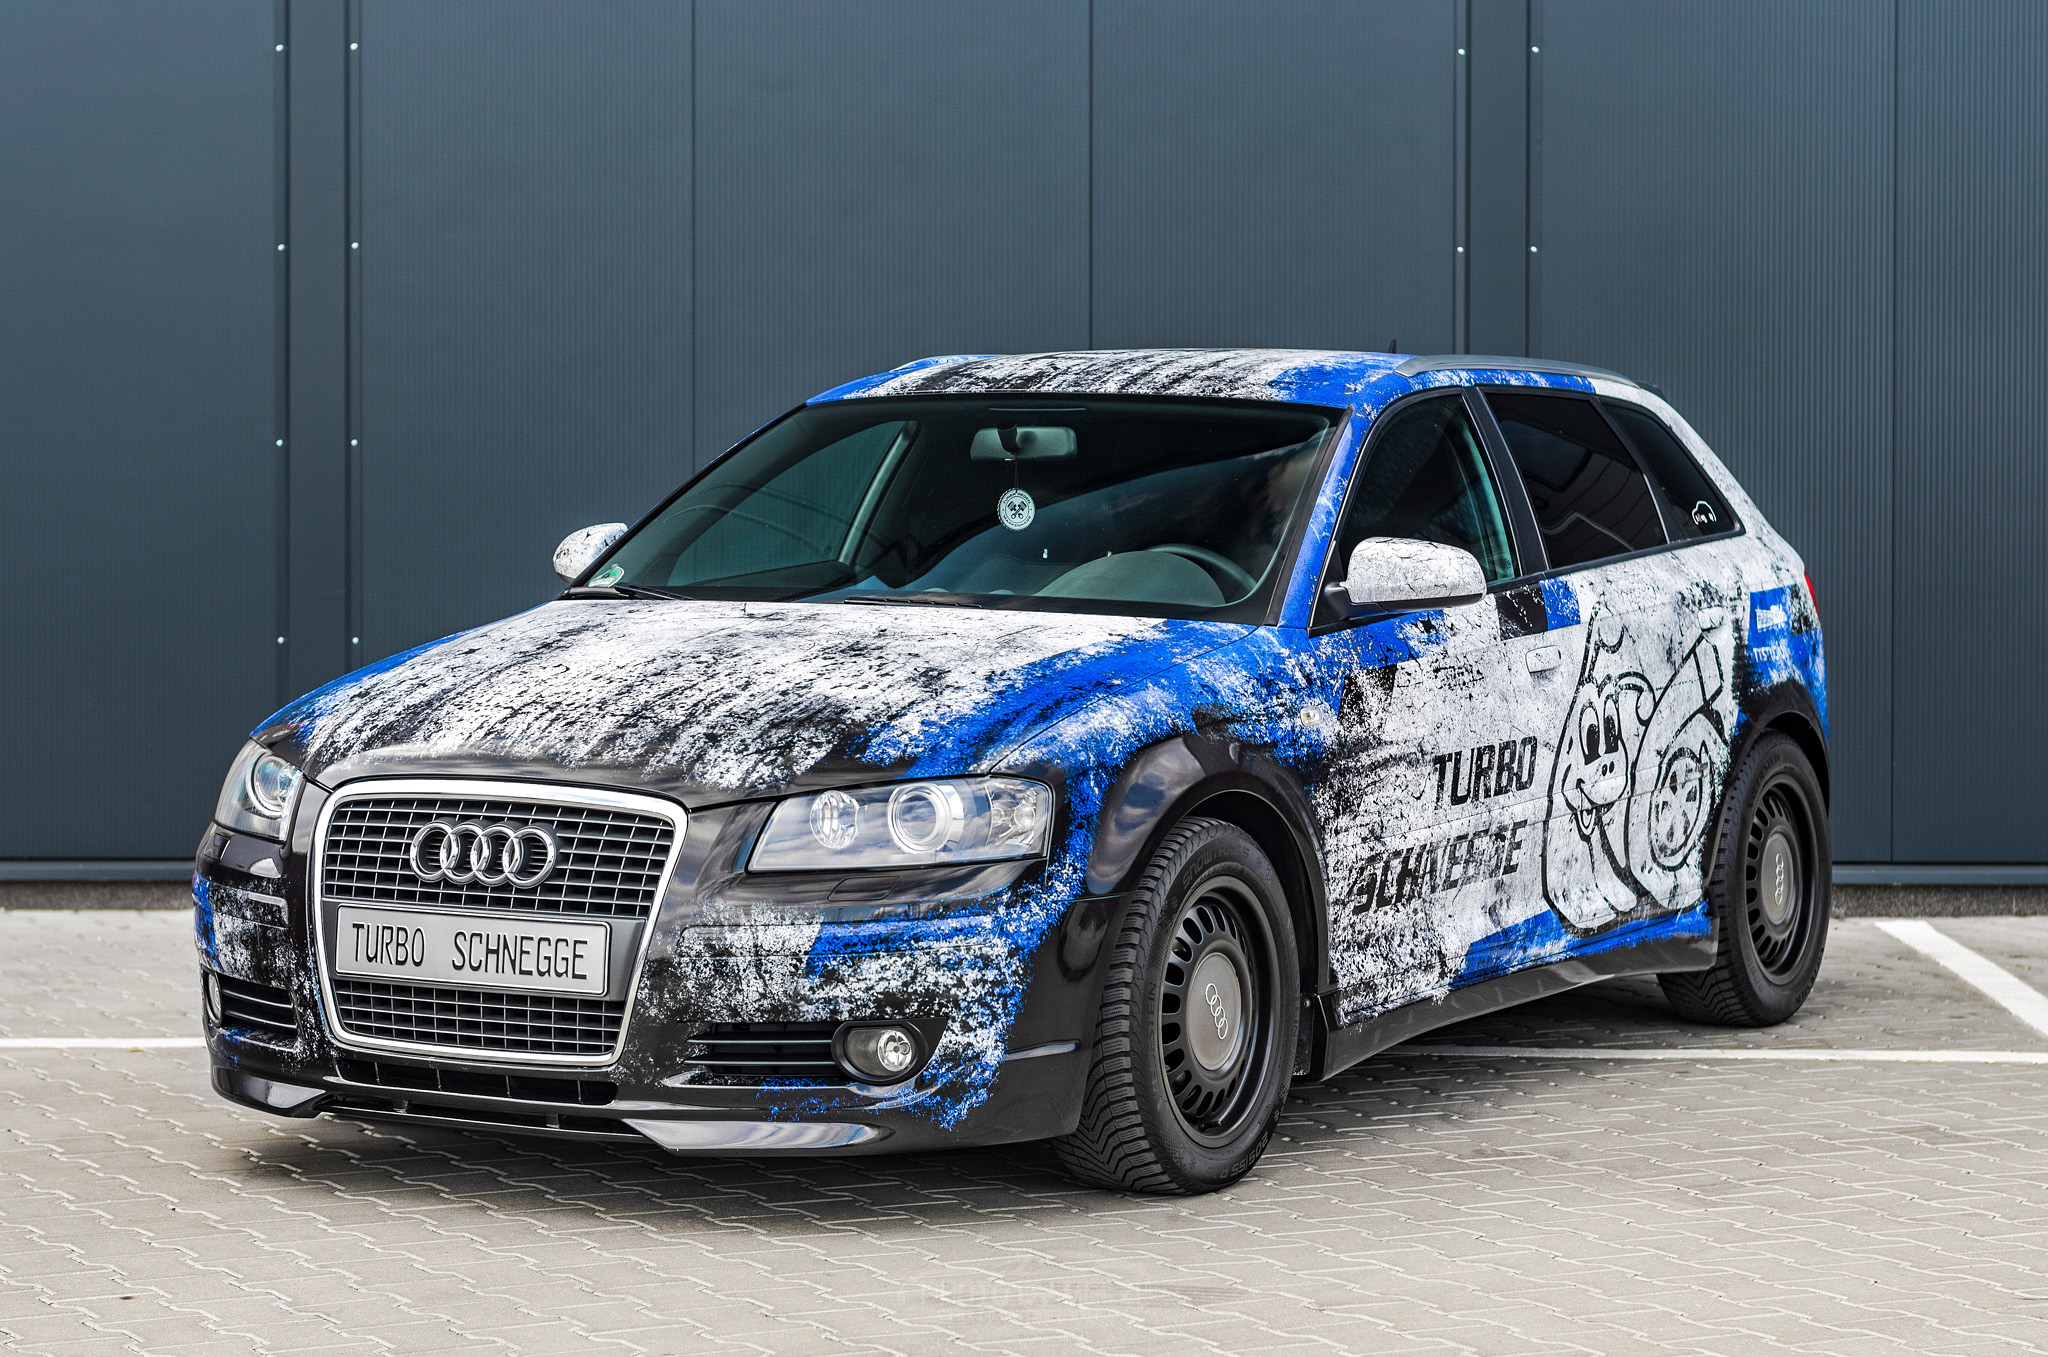 💥 Audi A3 Turboschnecke 💥